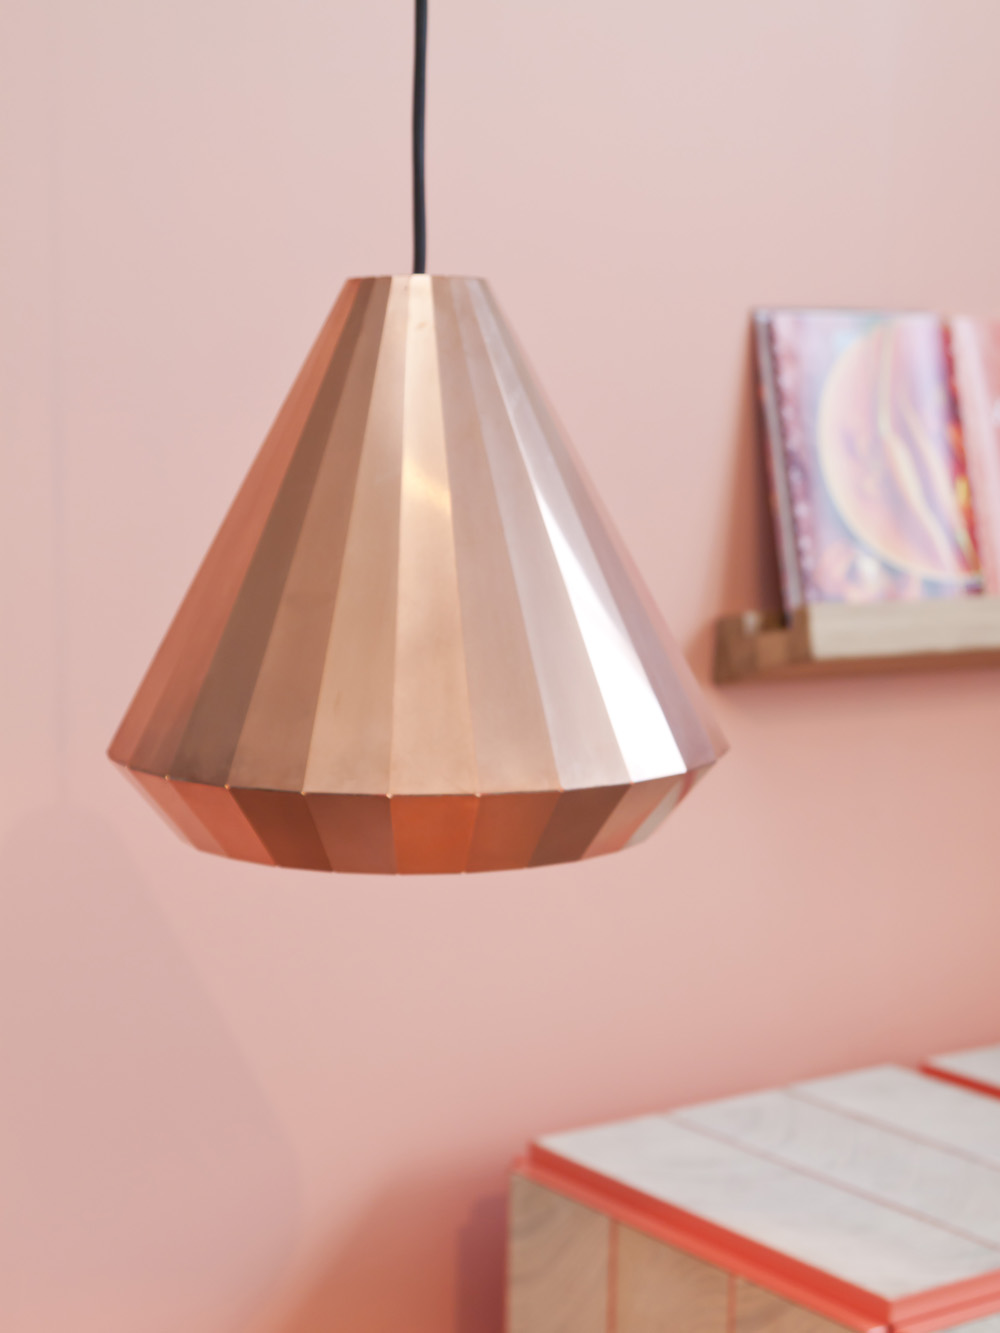 Vij5-Copper-Light-setting-image-by-Vij5-1 RS.jpg